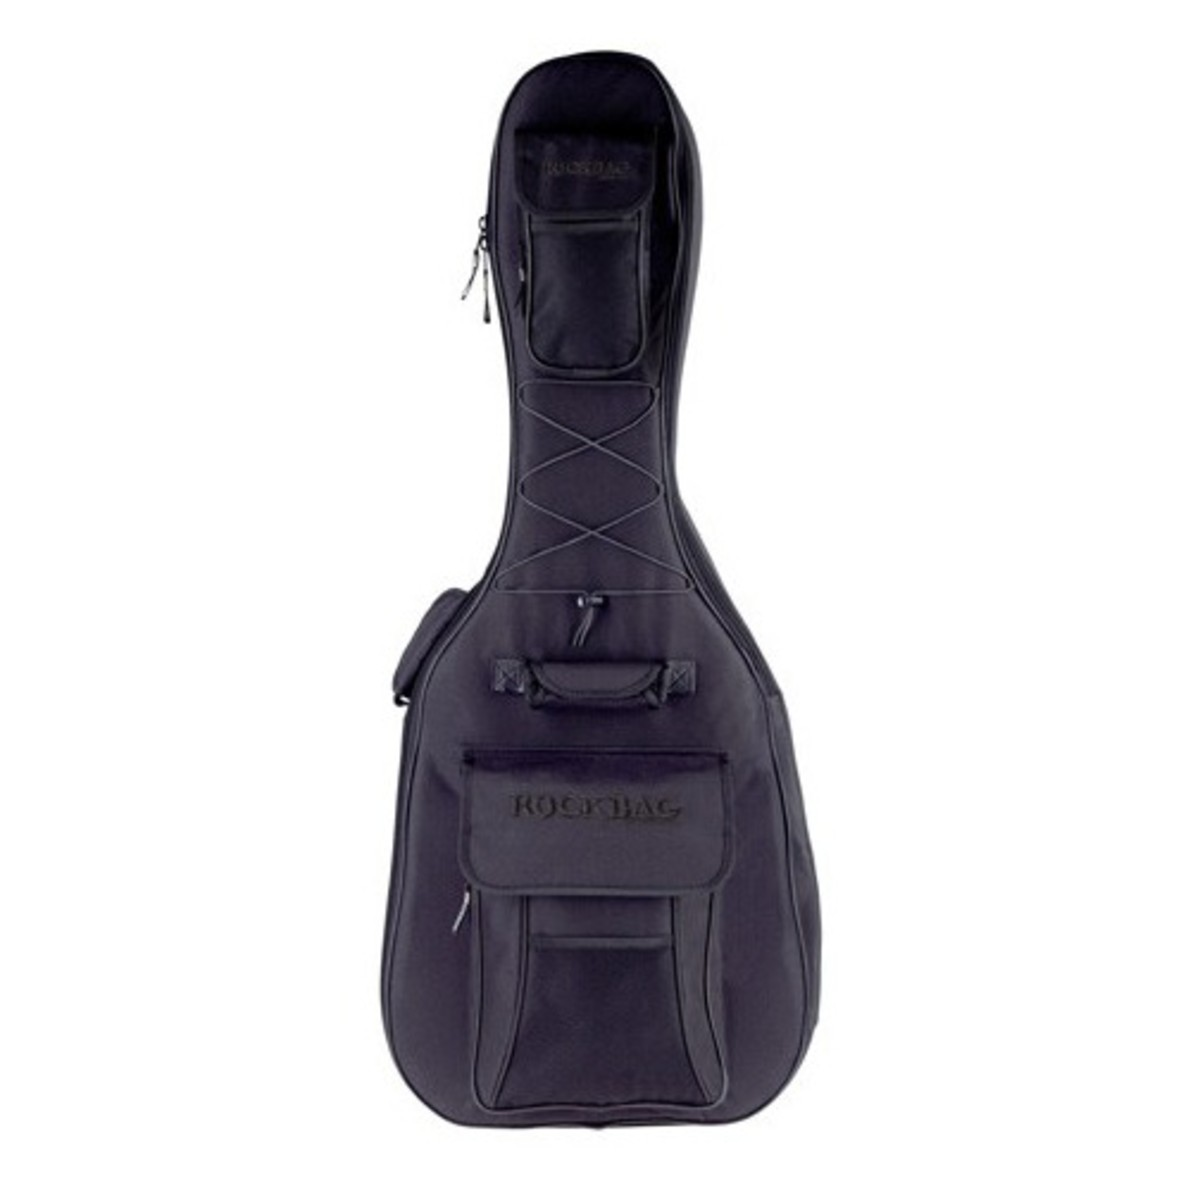 Rockbag Starline Classical Guitar Bag 25fGDn3QV